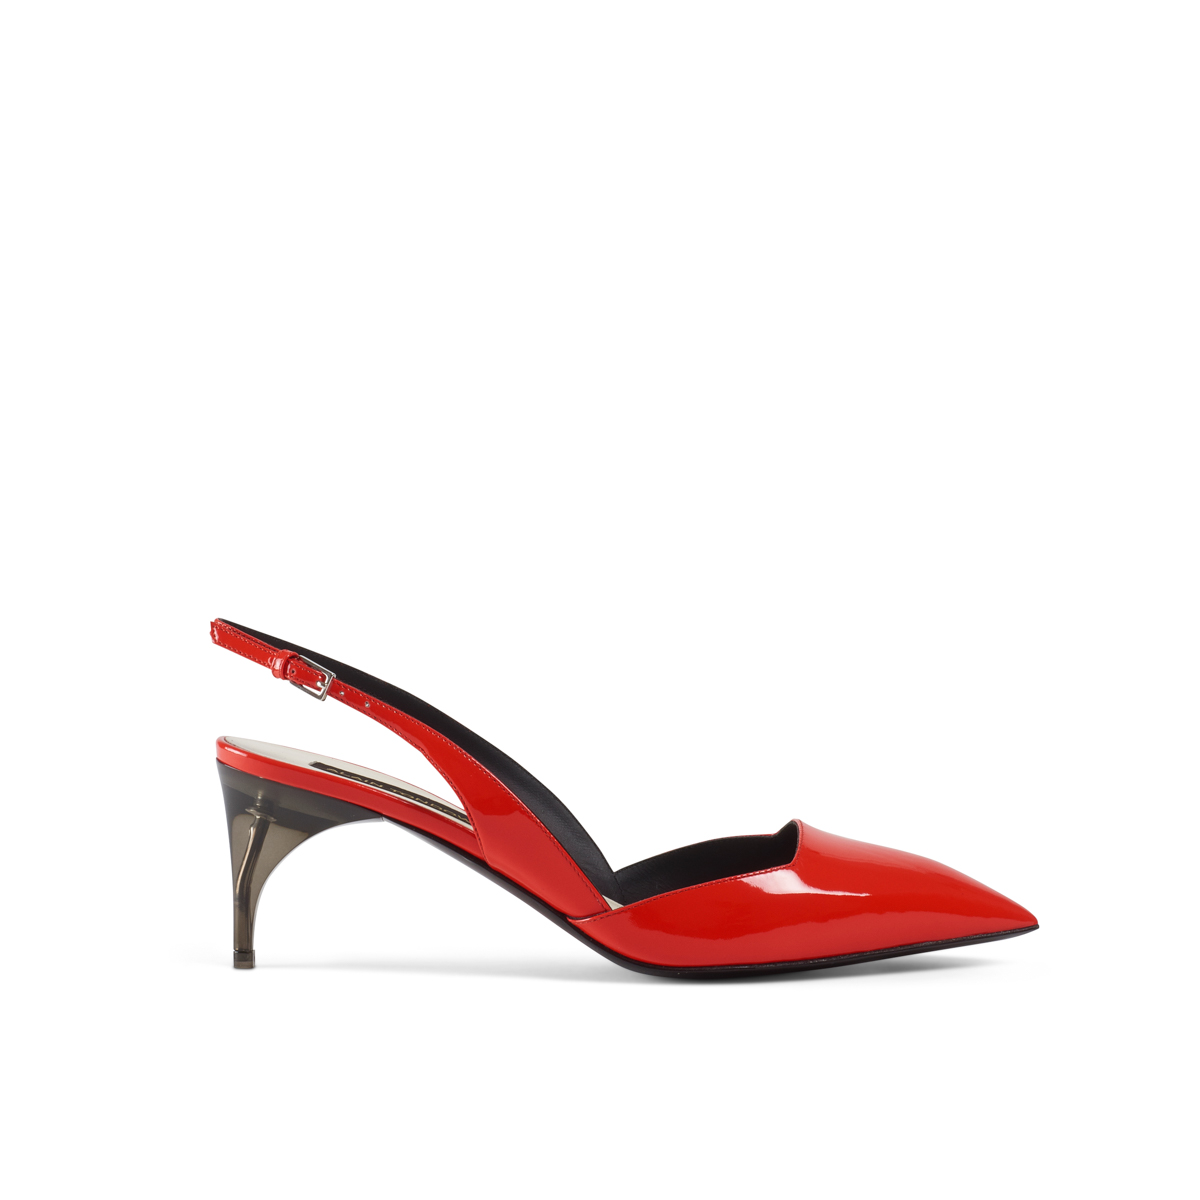 007_alaintondowski_springsummer2017_shoes_3042